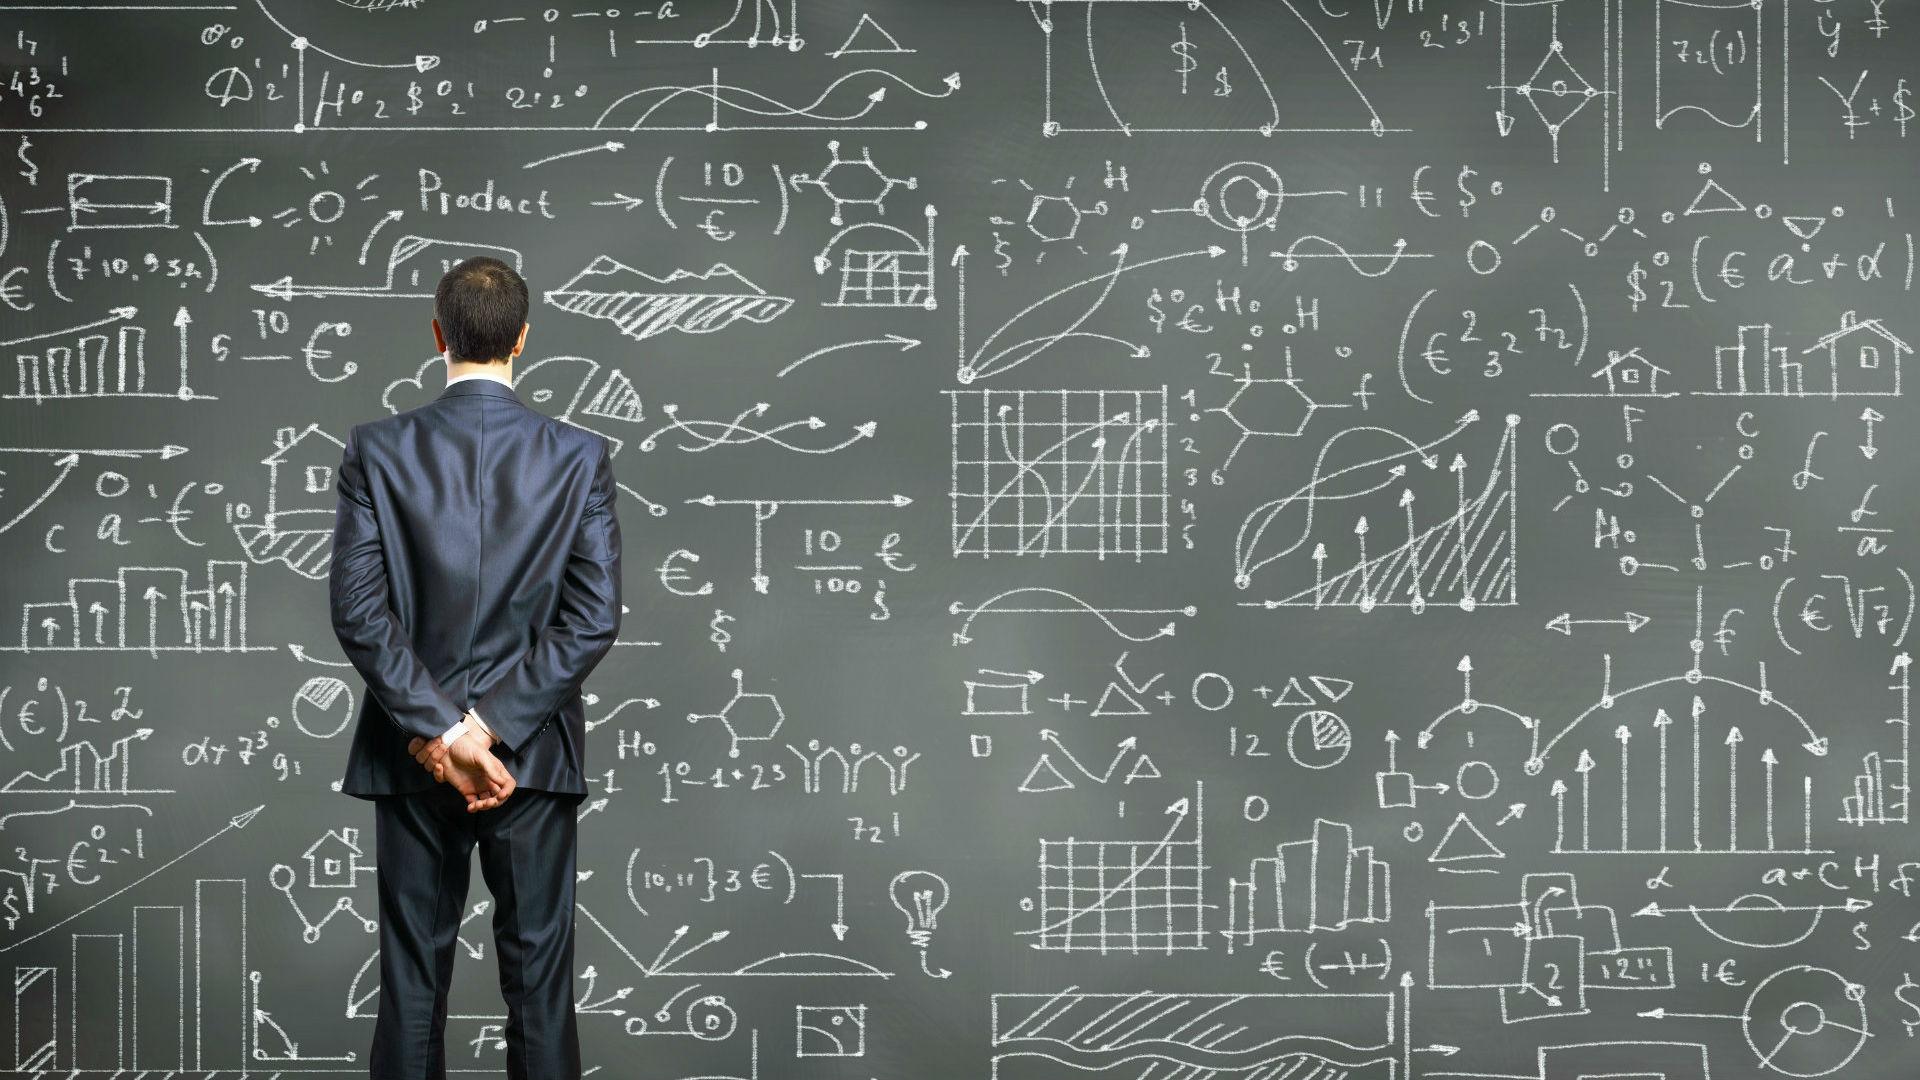 man-data-analytics-chalkboard-ss-1920